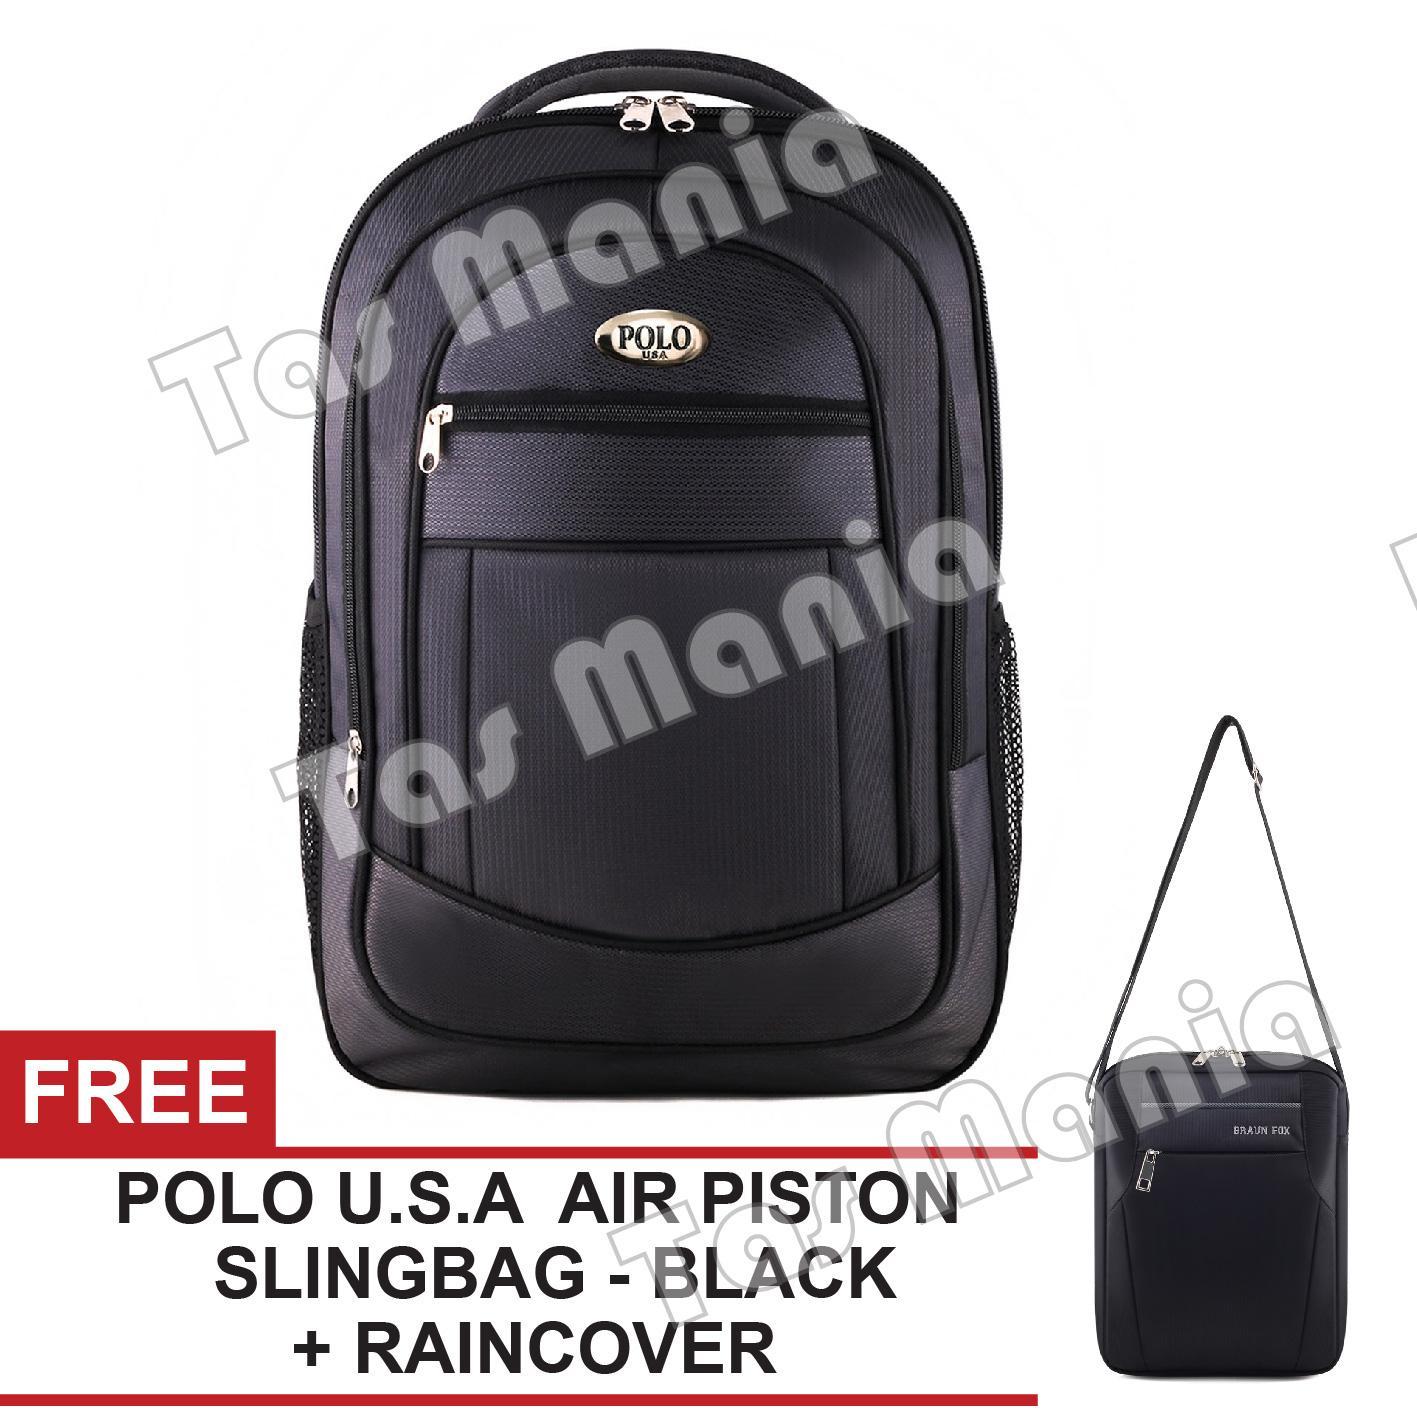 Tas Ransel Polo USA King Cobra Tas Laptop Backpack + Raincover + FREE Polo USA Air